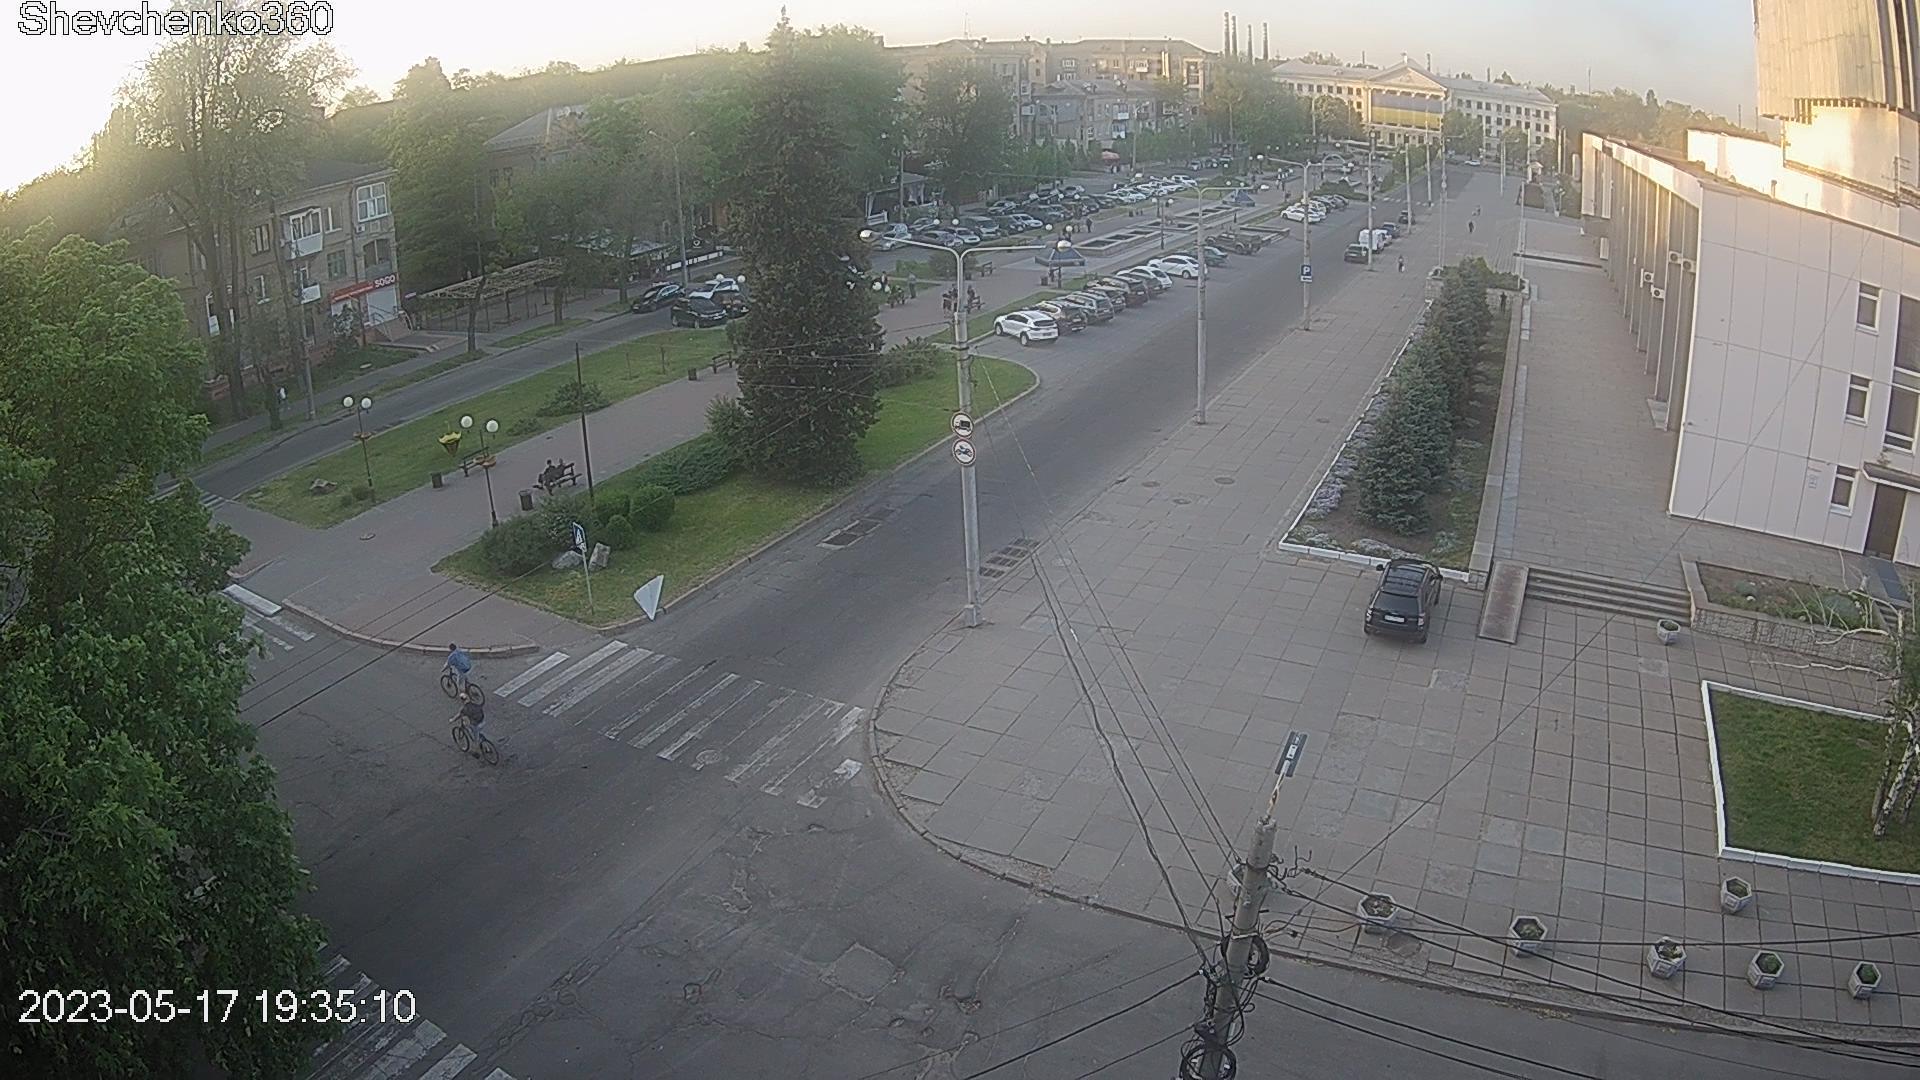 Webkamera Voznesenka: бульвар Шевченко